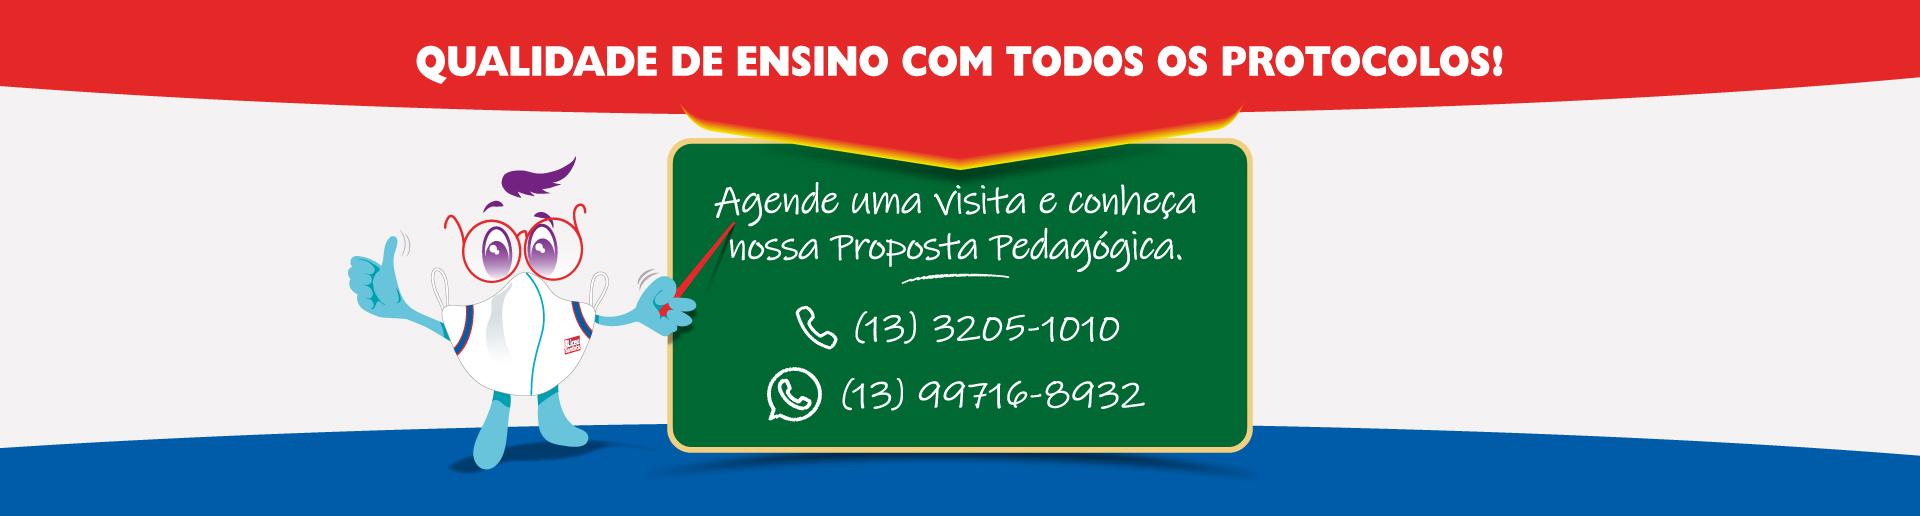 53-LS-Protocolos-Mascarenhas-1920x516px